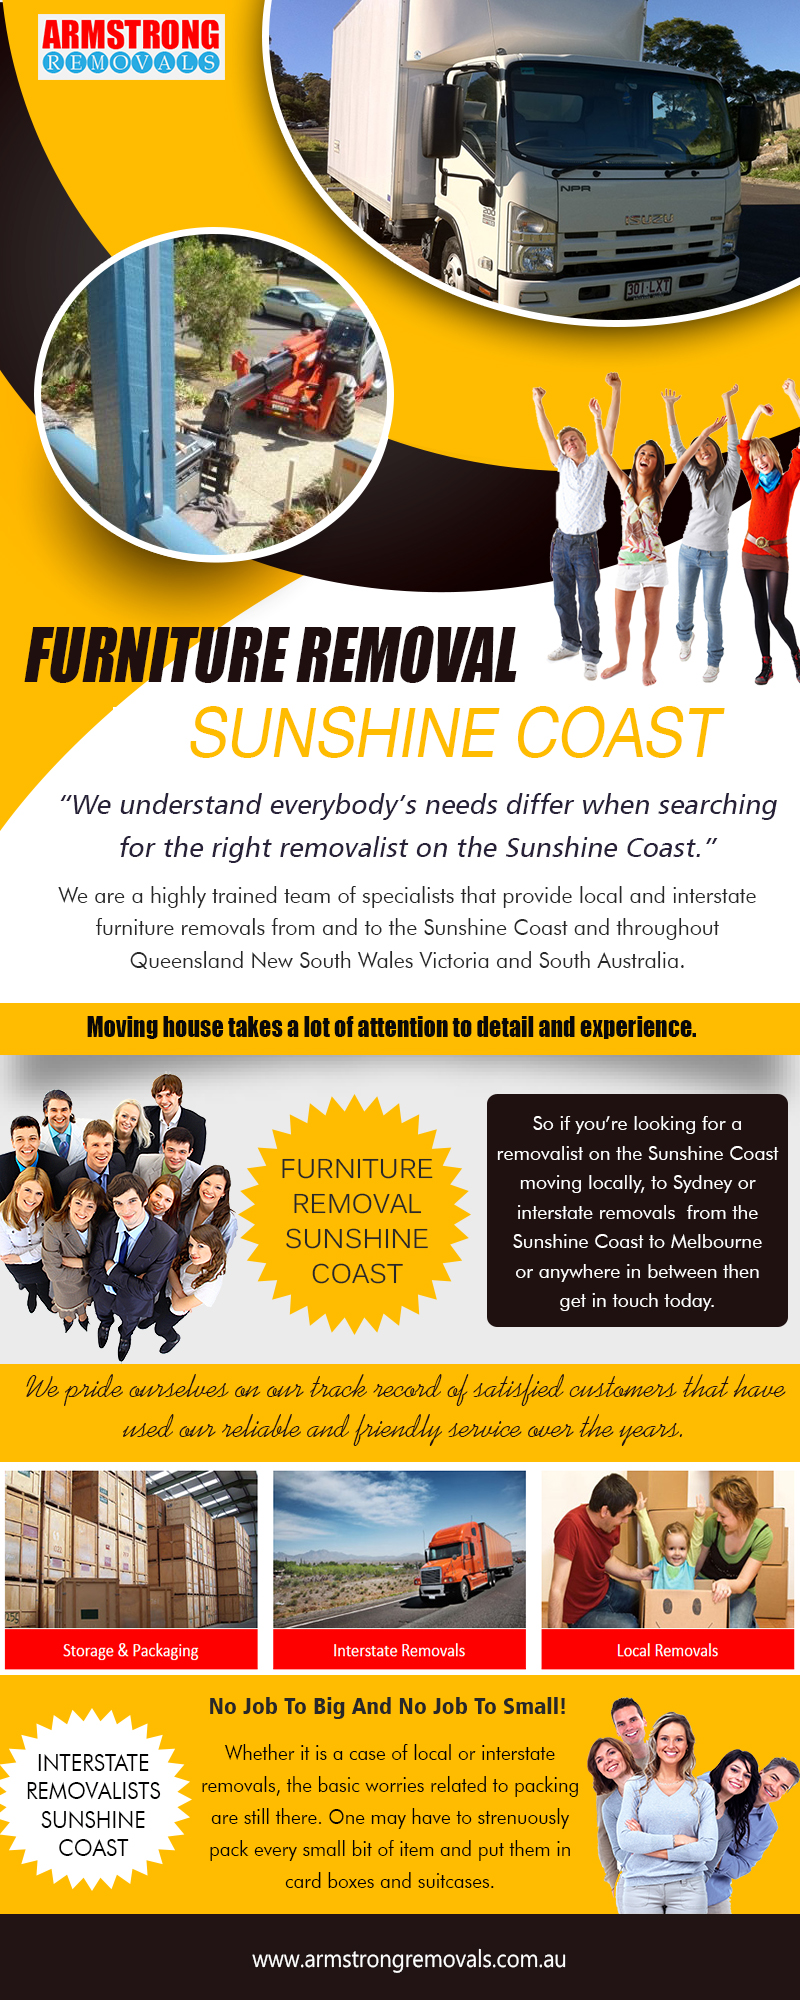 Furniture Removals Sunshine Coast | armstrongremovals.com.au